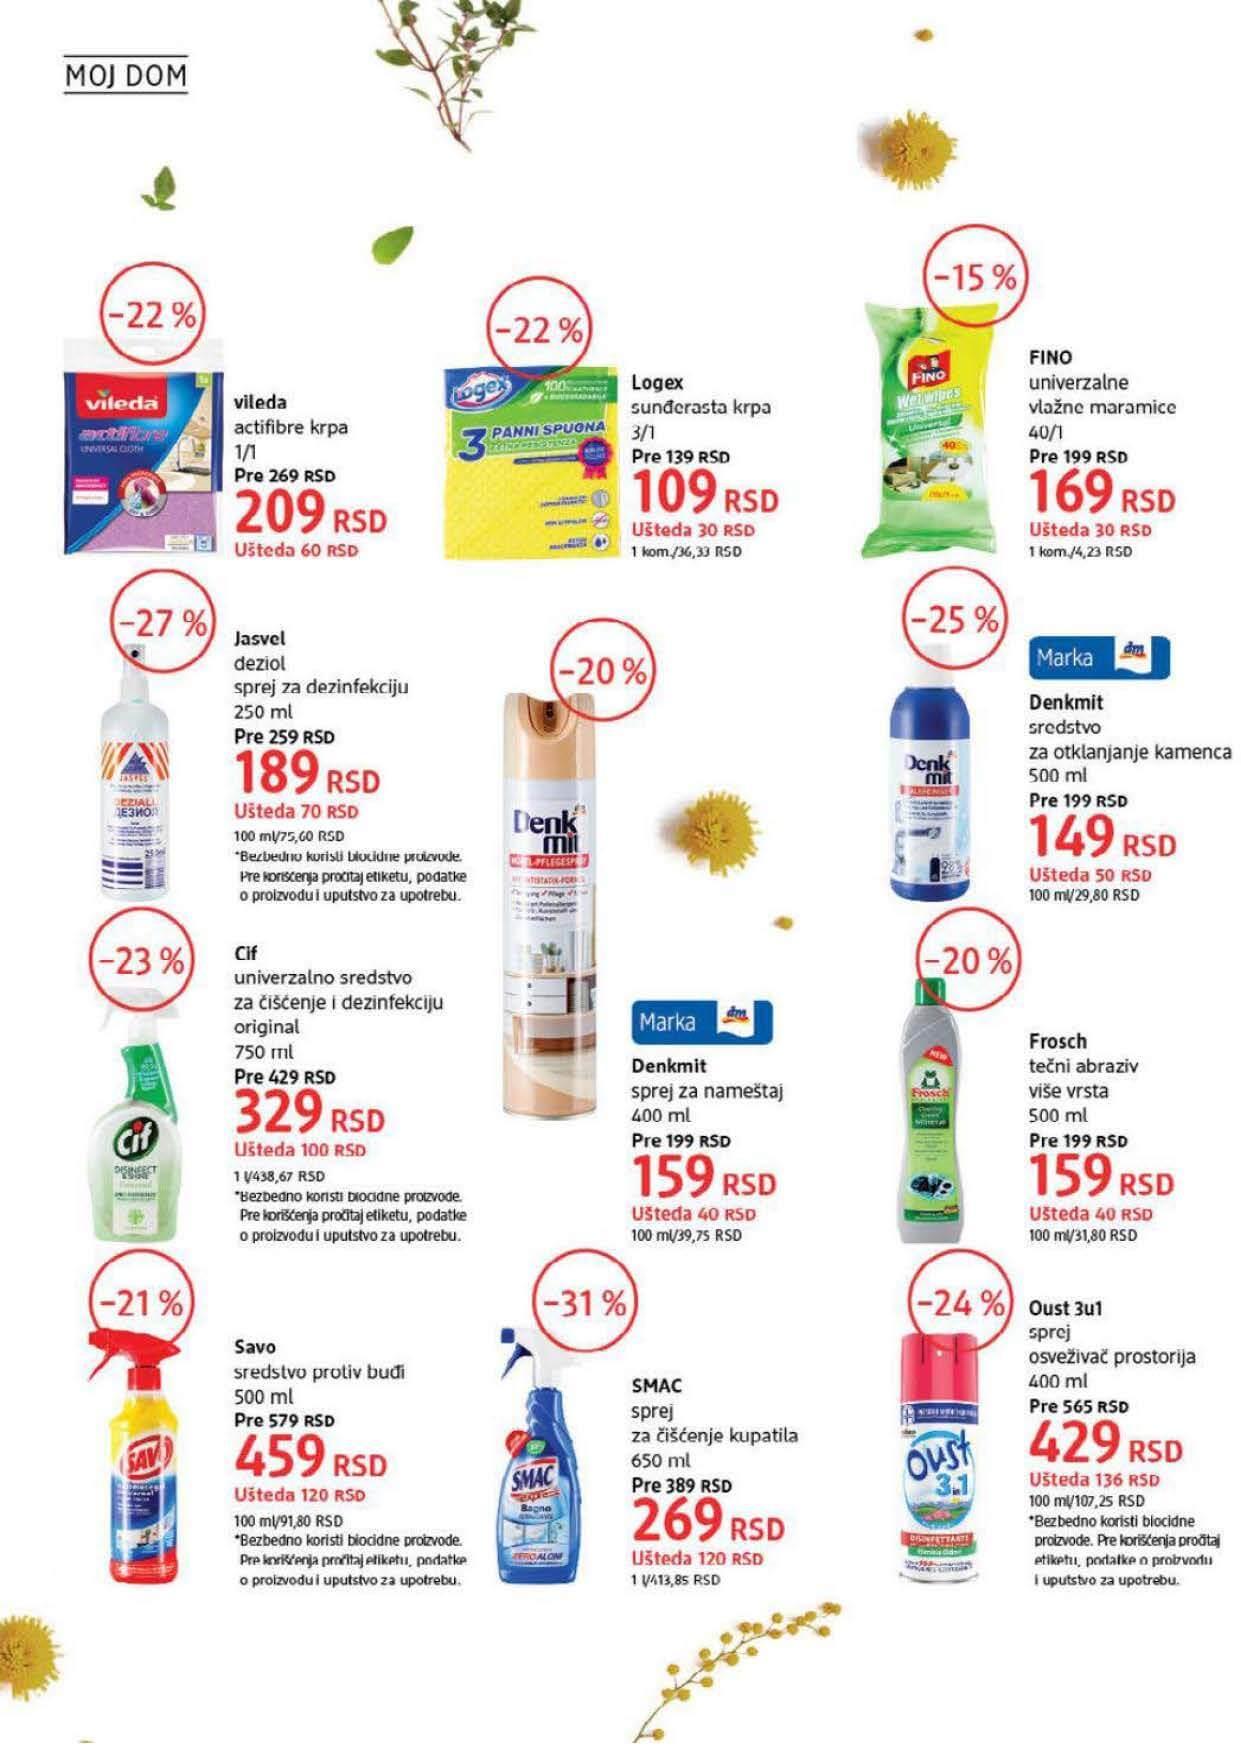 DM Katalog Srbija SEPTEMBAR 2021 1.9.2021. 30.9.2021. Page 36